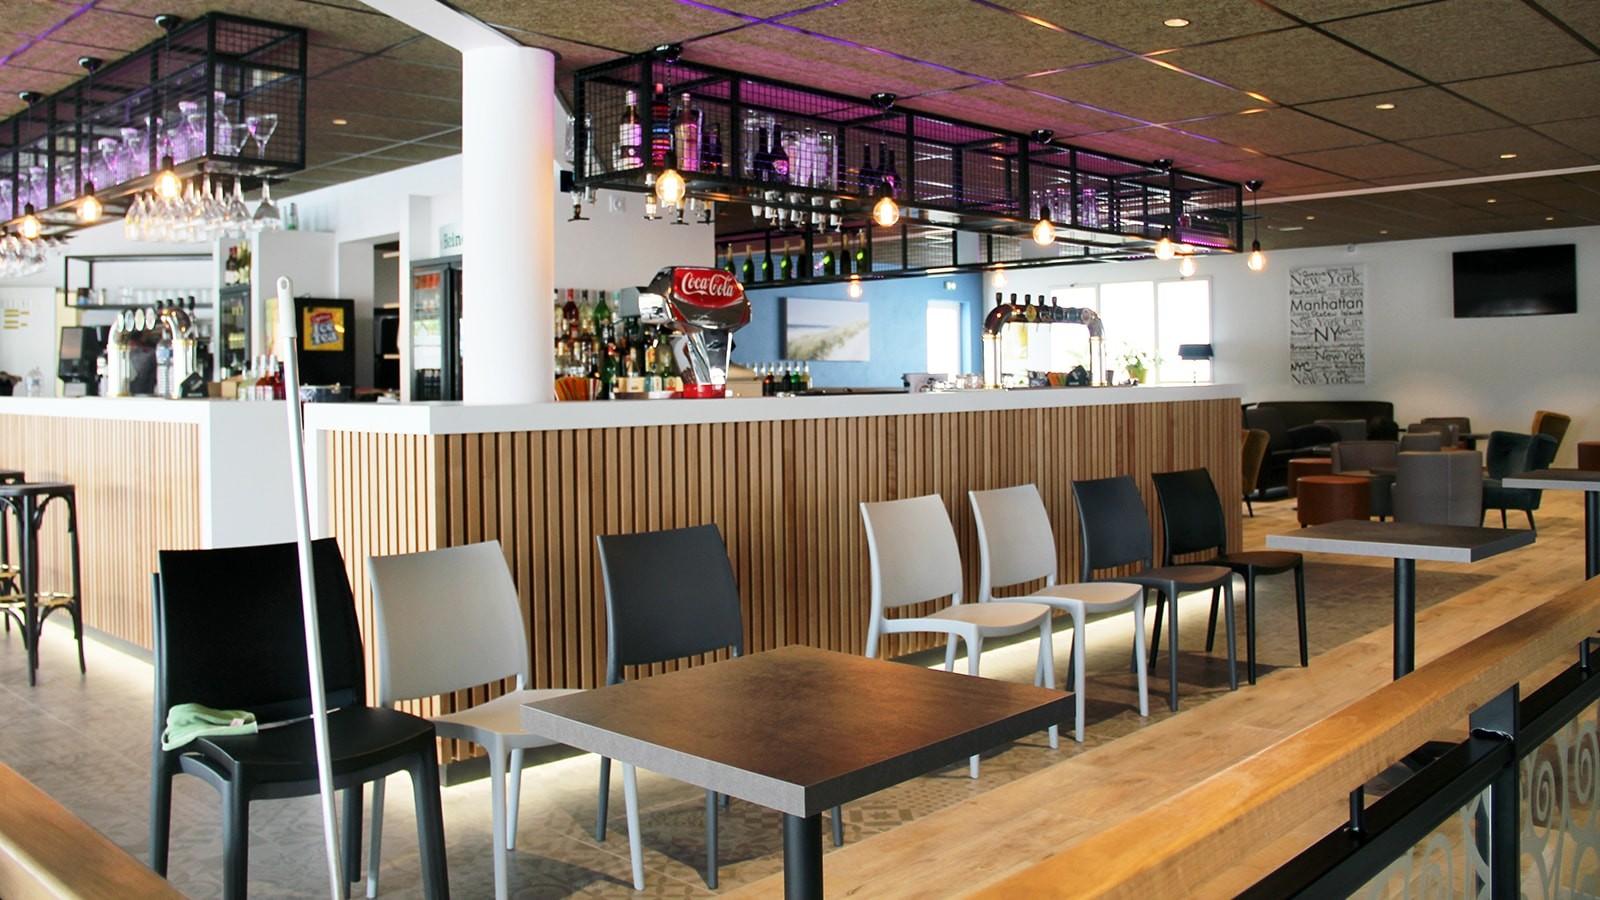 EFI Design Bar Clarys Saint Jean De Monts Efi Design (3) 1212